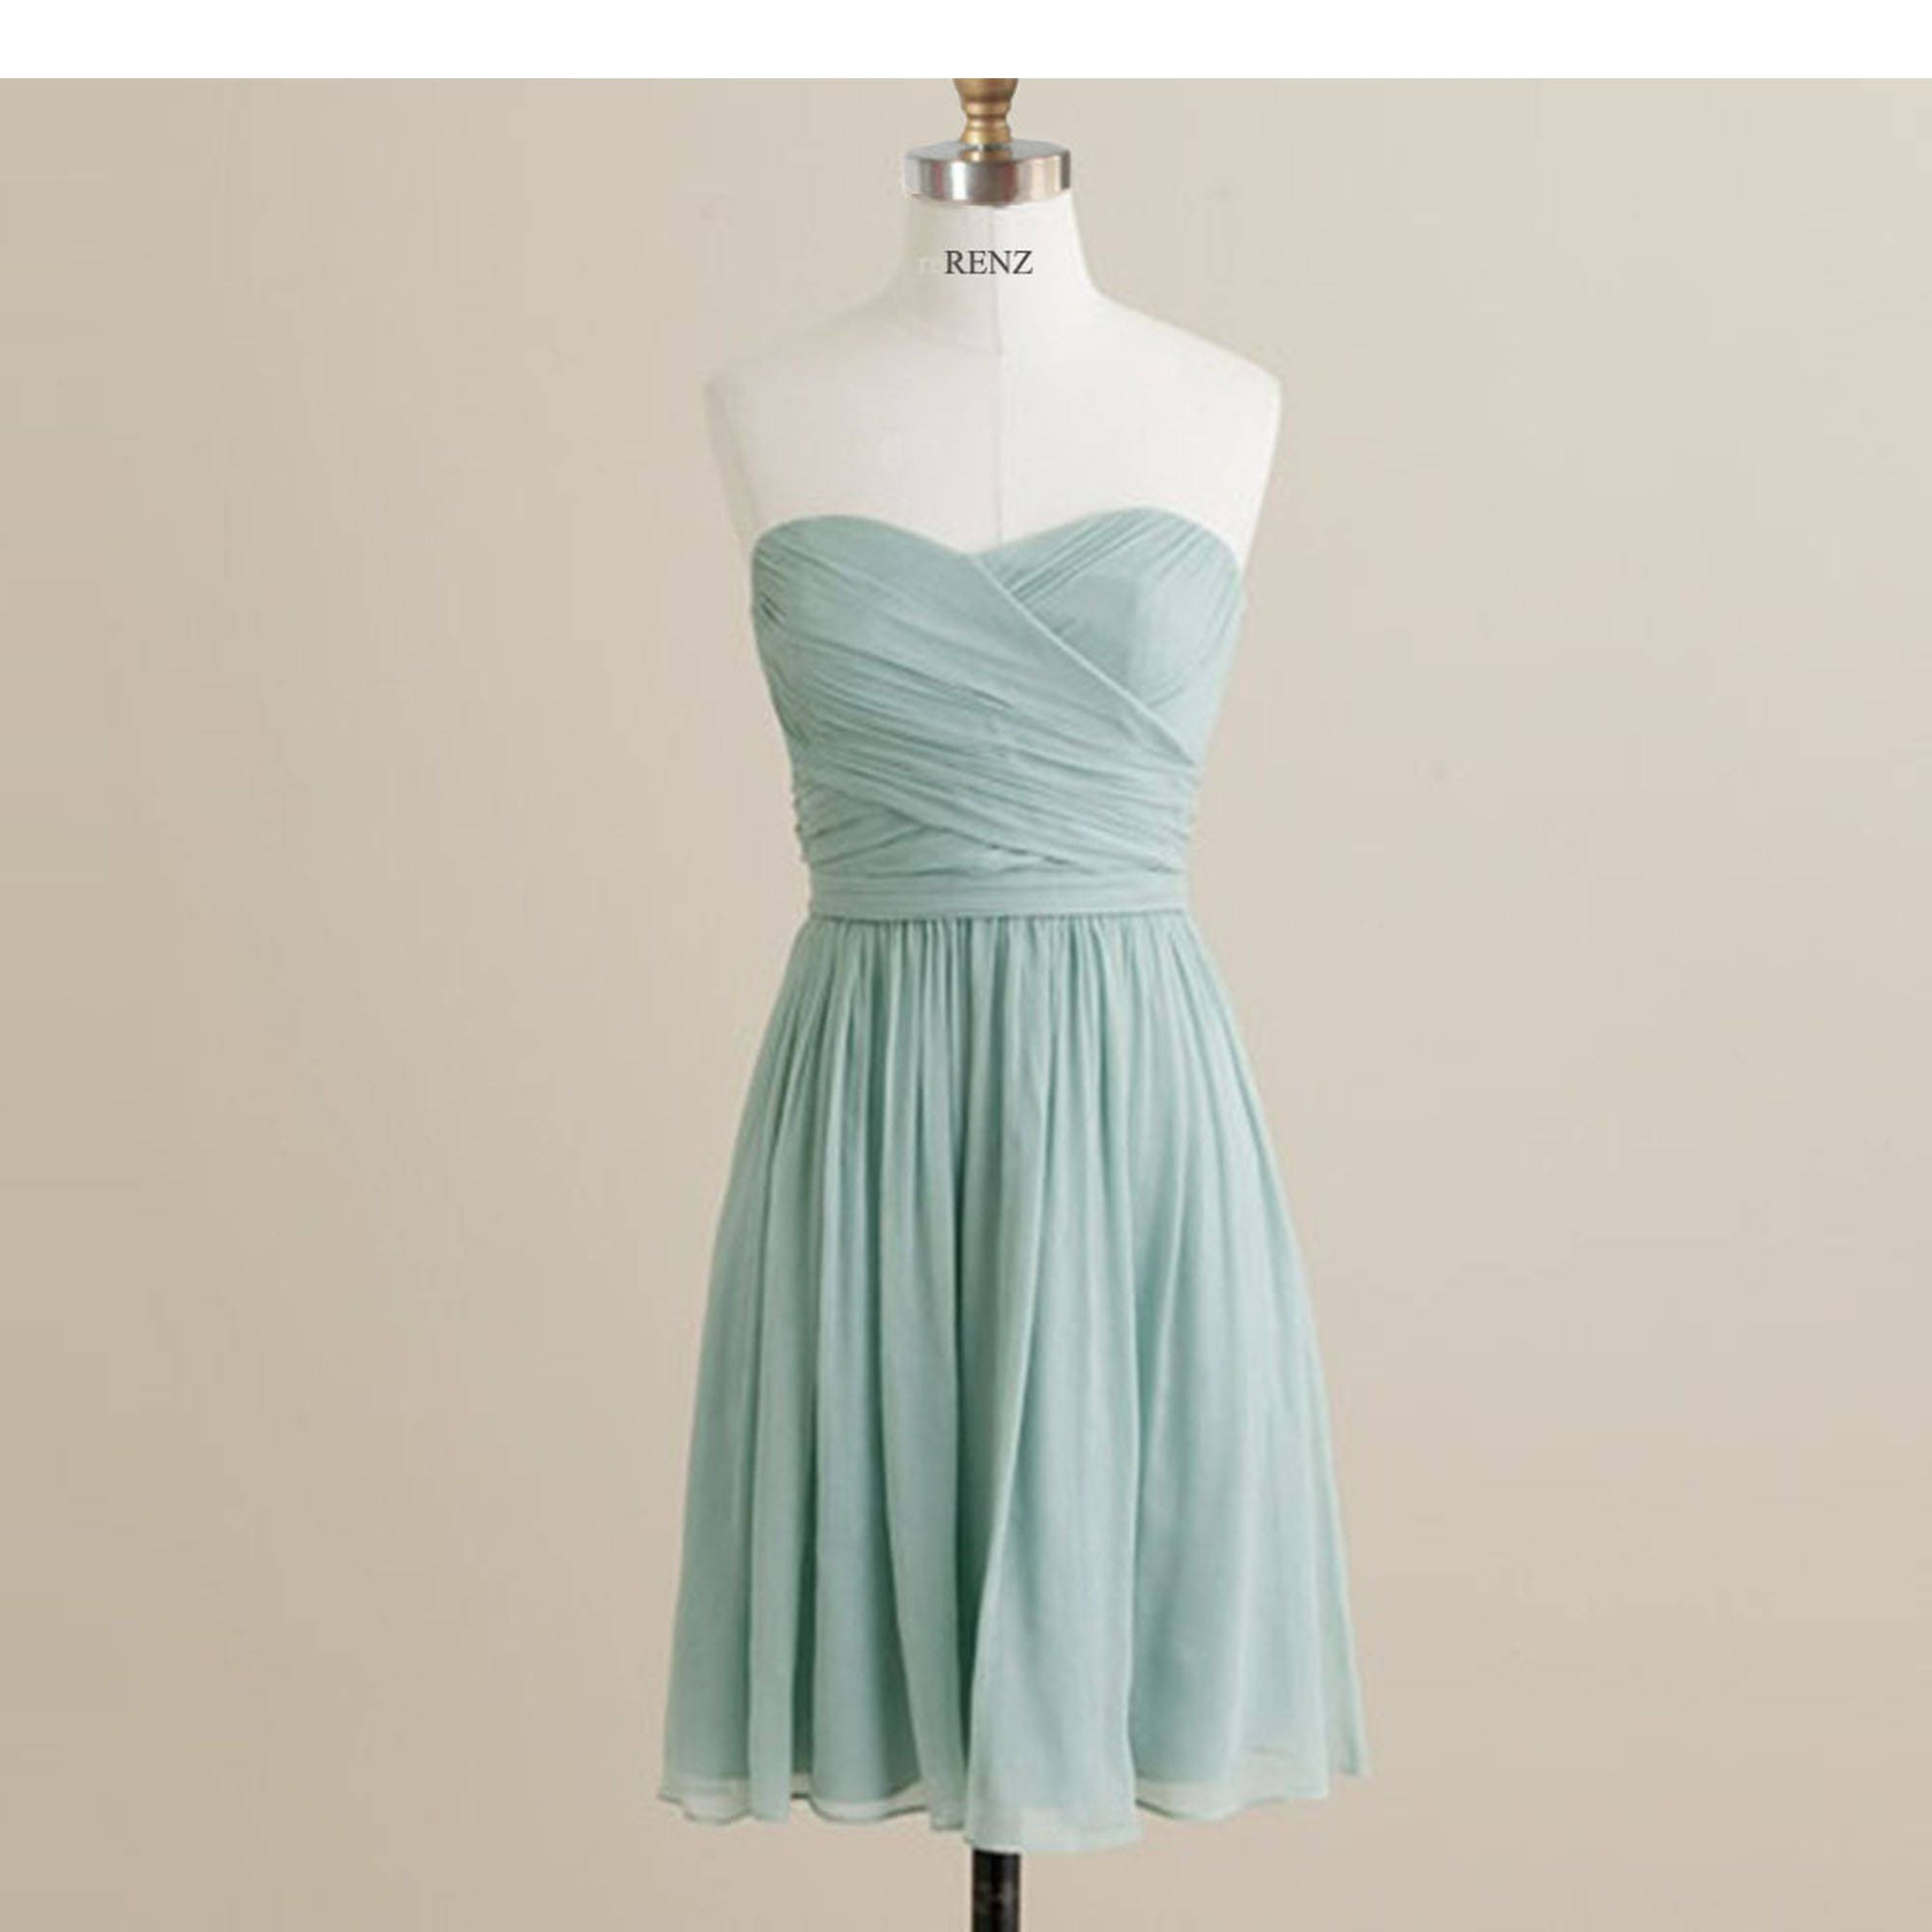 Bridesmaid Dress Dusty Mint Chiffon DressShort Strapless Prom